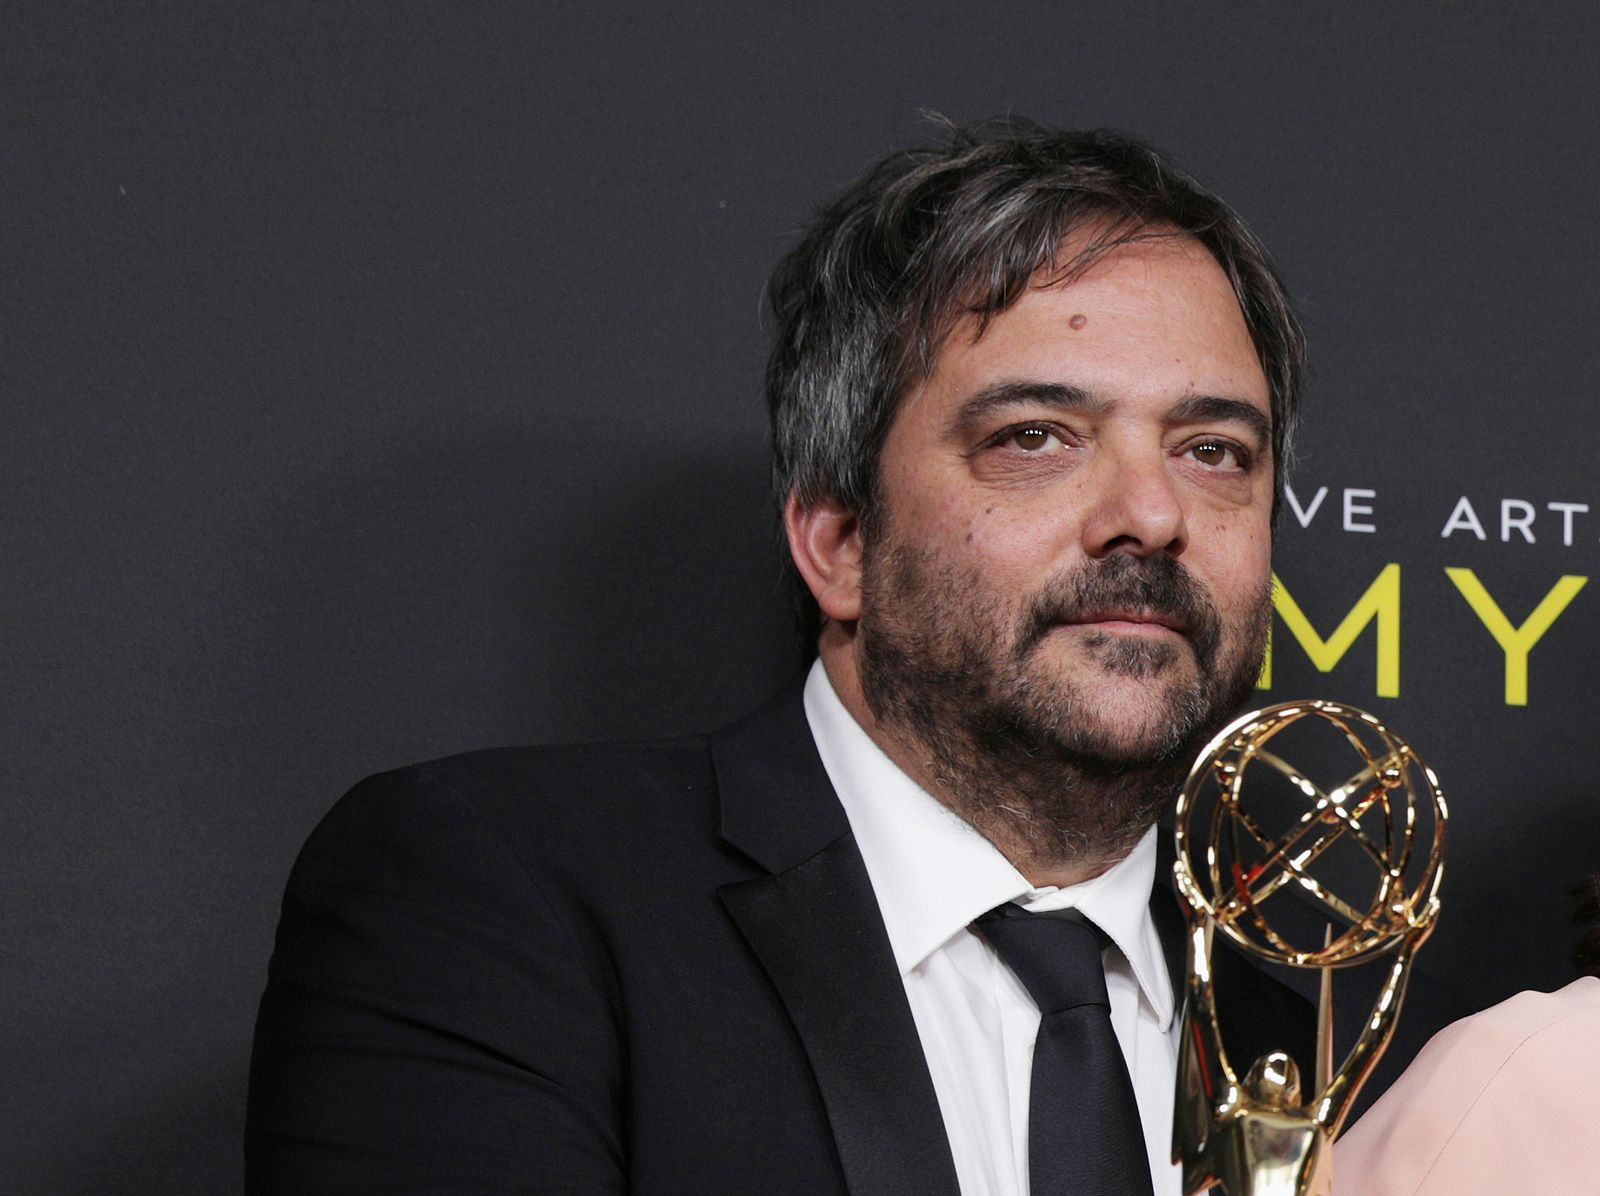 FILE PHOTO: 2019 Creative Arts Emmy Awards